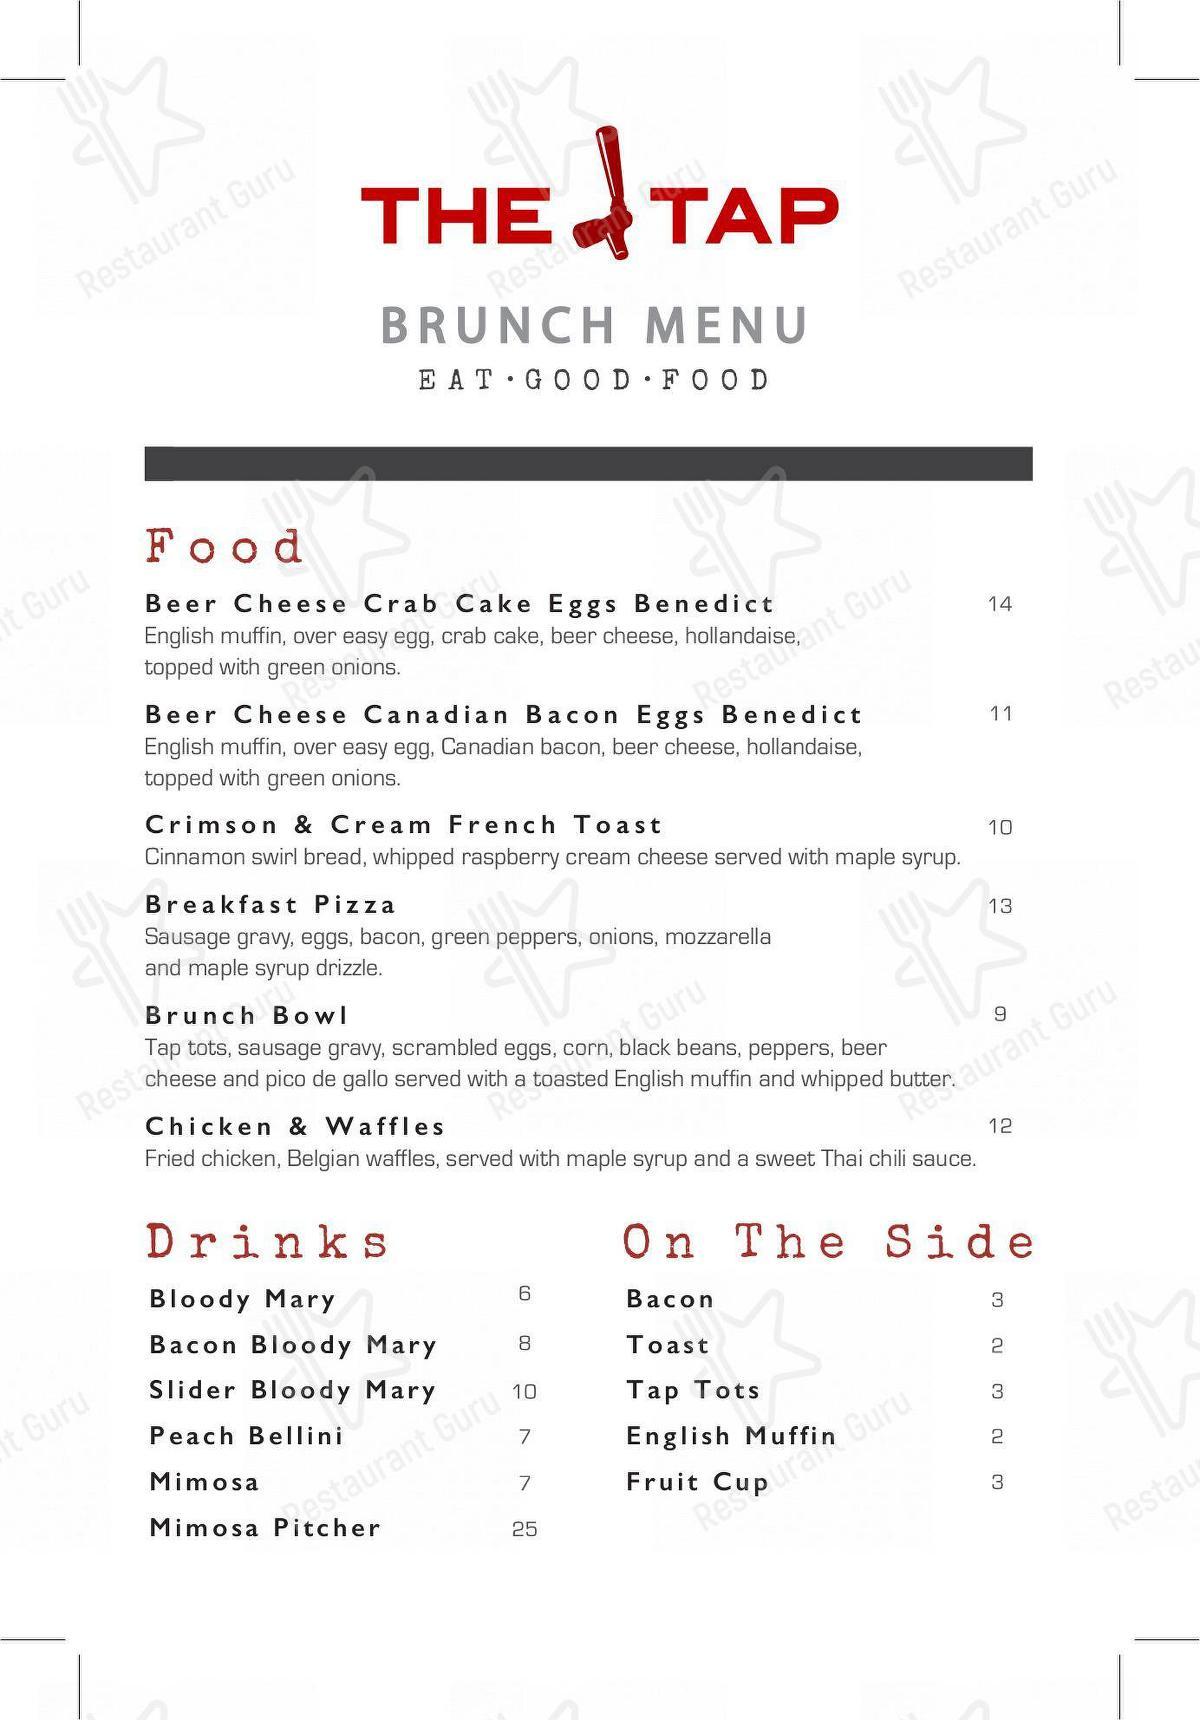 Food-Menu for the Bier Brewery & Tap Room pub & bar